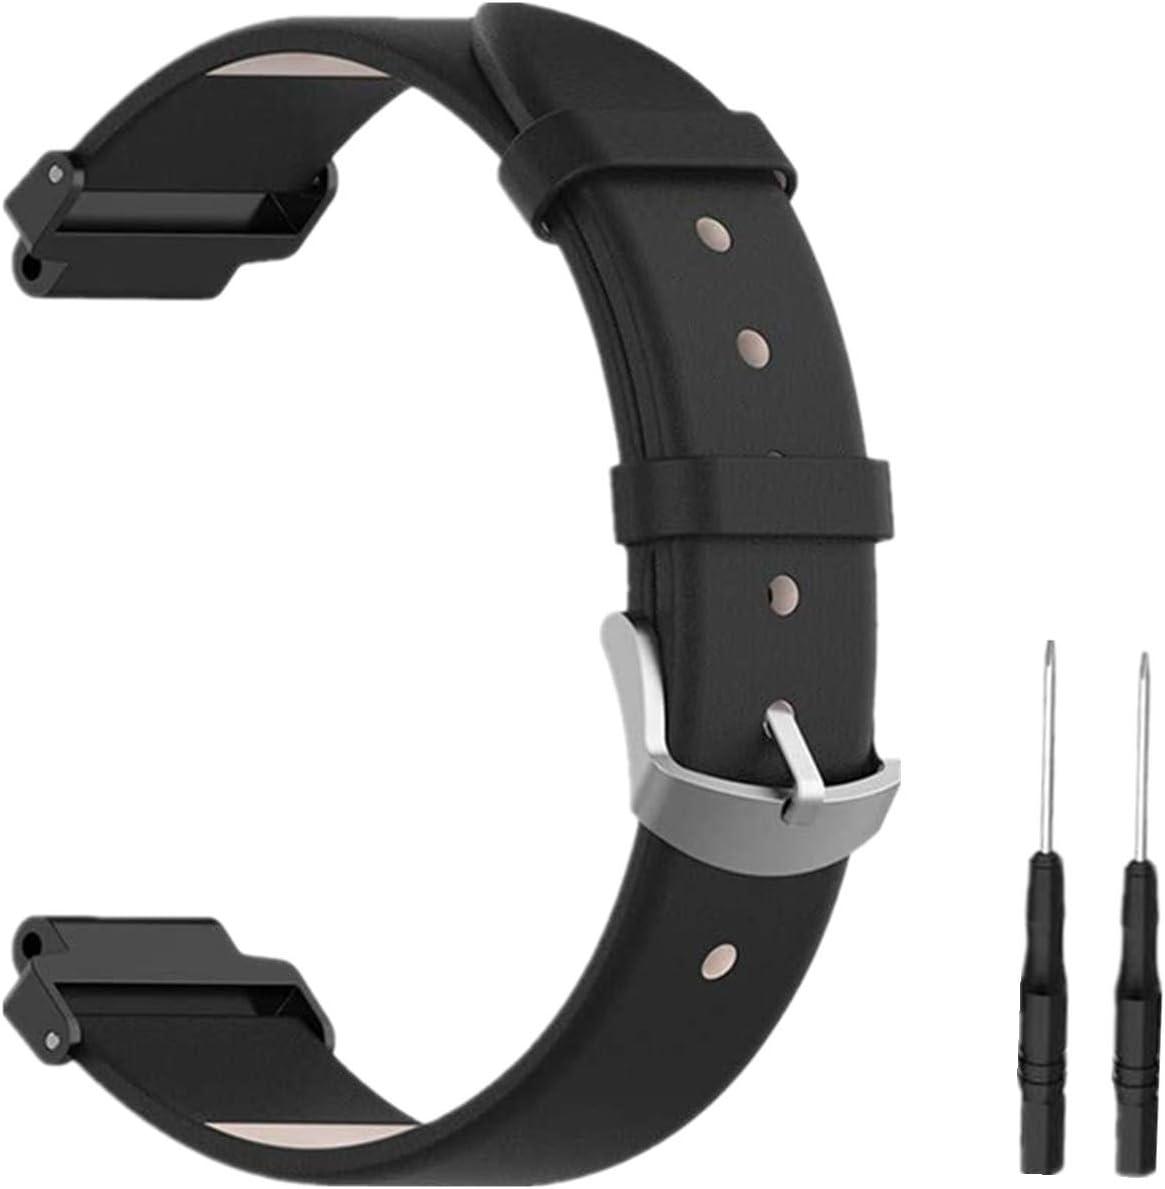 Meiruo Leder Ersatz Uhrenarmband Watch Band Armband Für Garmin Forerunner 220 235 630 620 735 Colour 1 Sport Freizeit